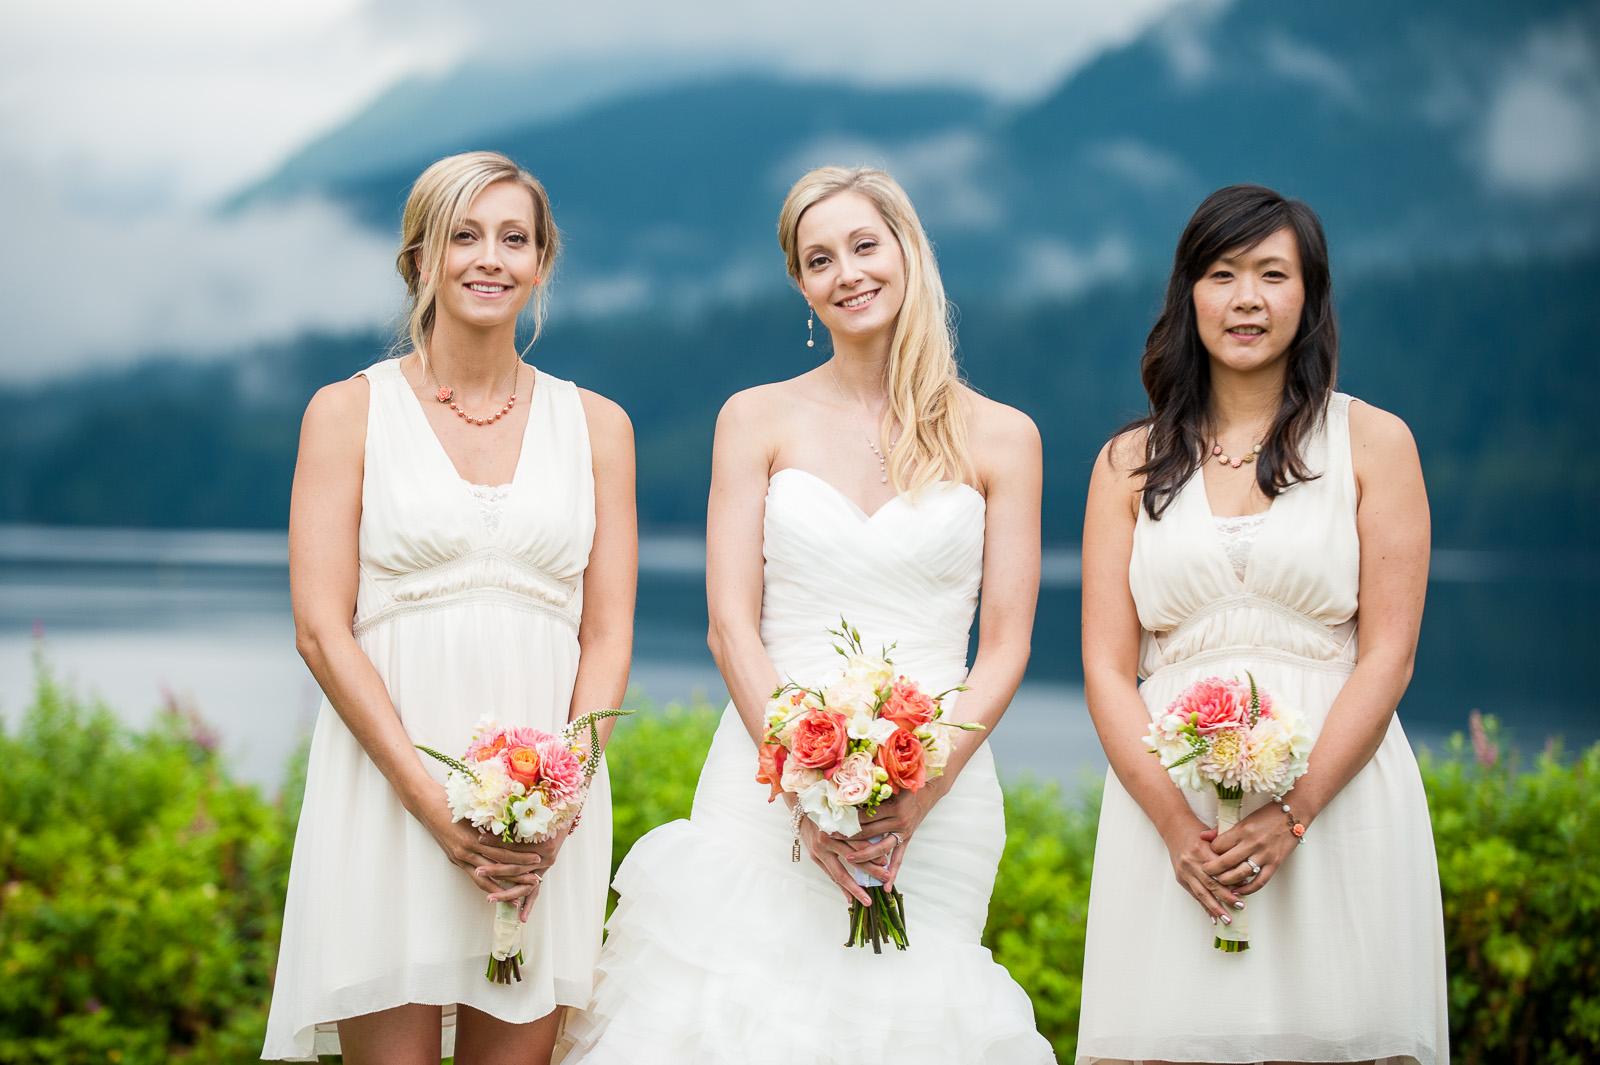 bc-wedding-photographers-cleveland-dam-wedding-13.jpg